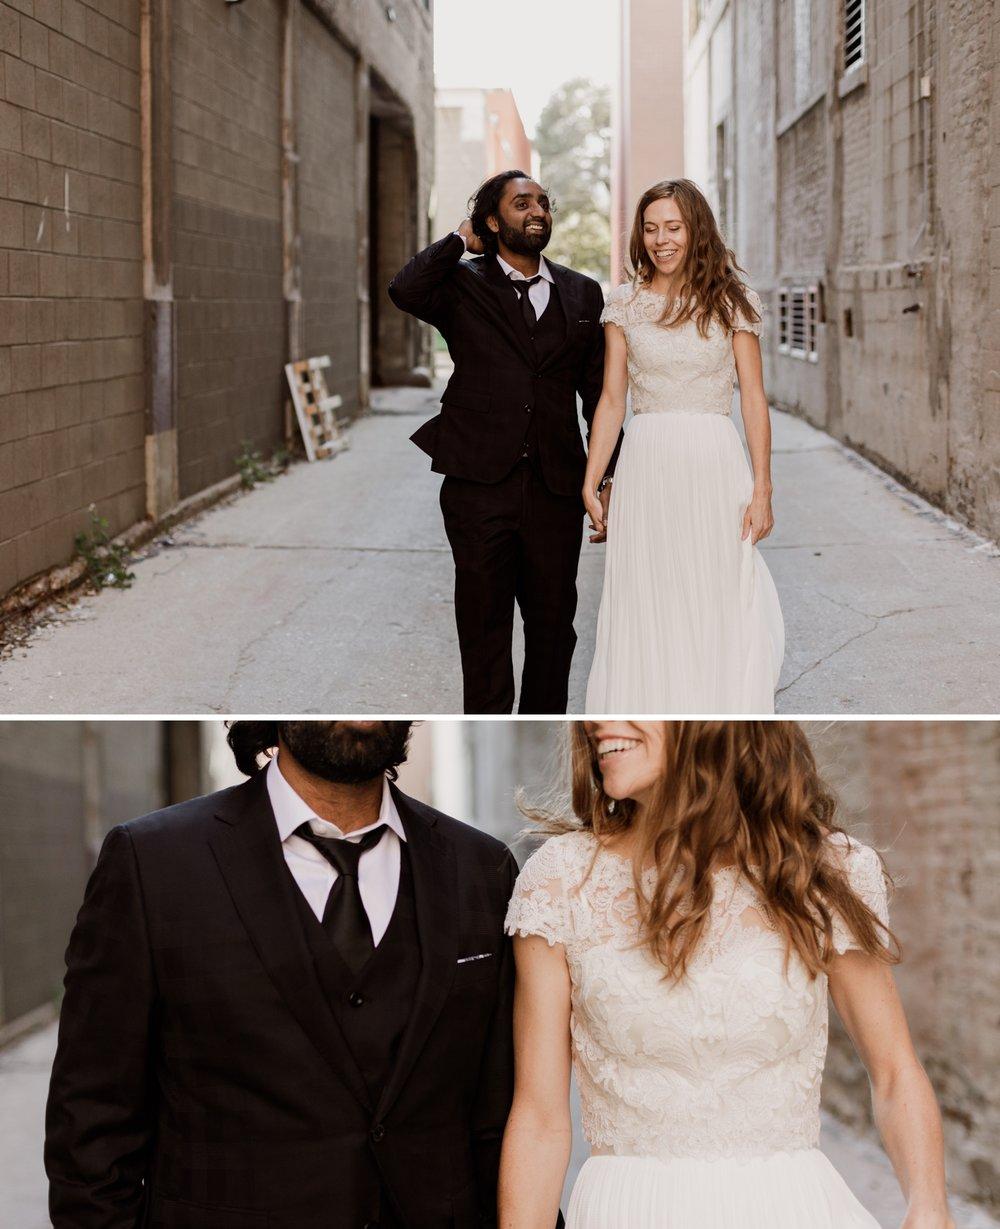 milwaukee-documentary-wedding-photography_0030.jpg